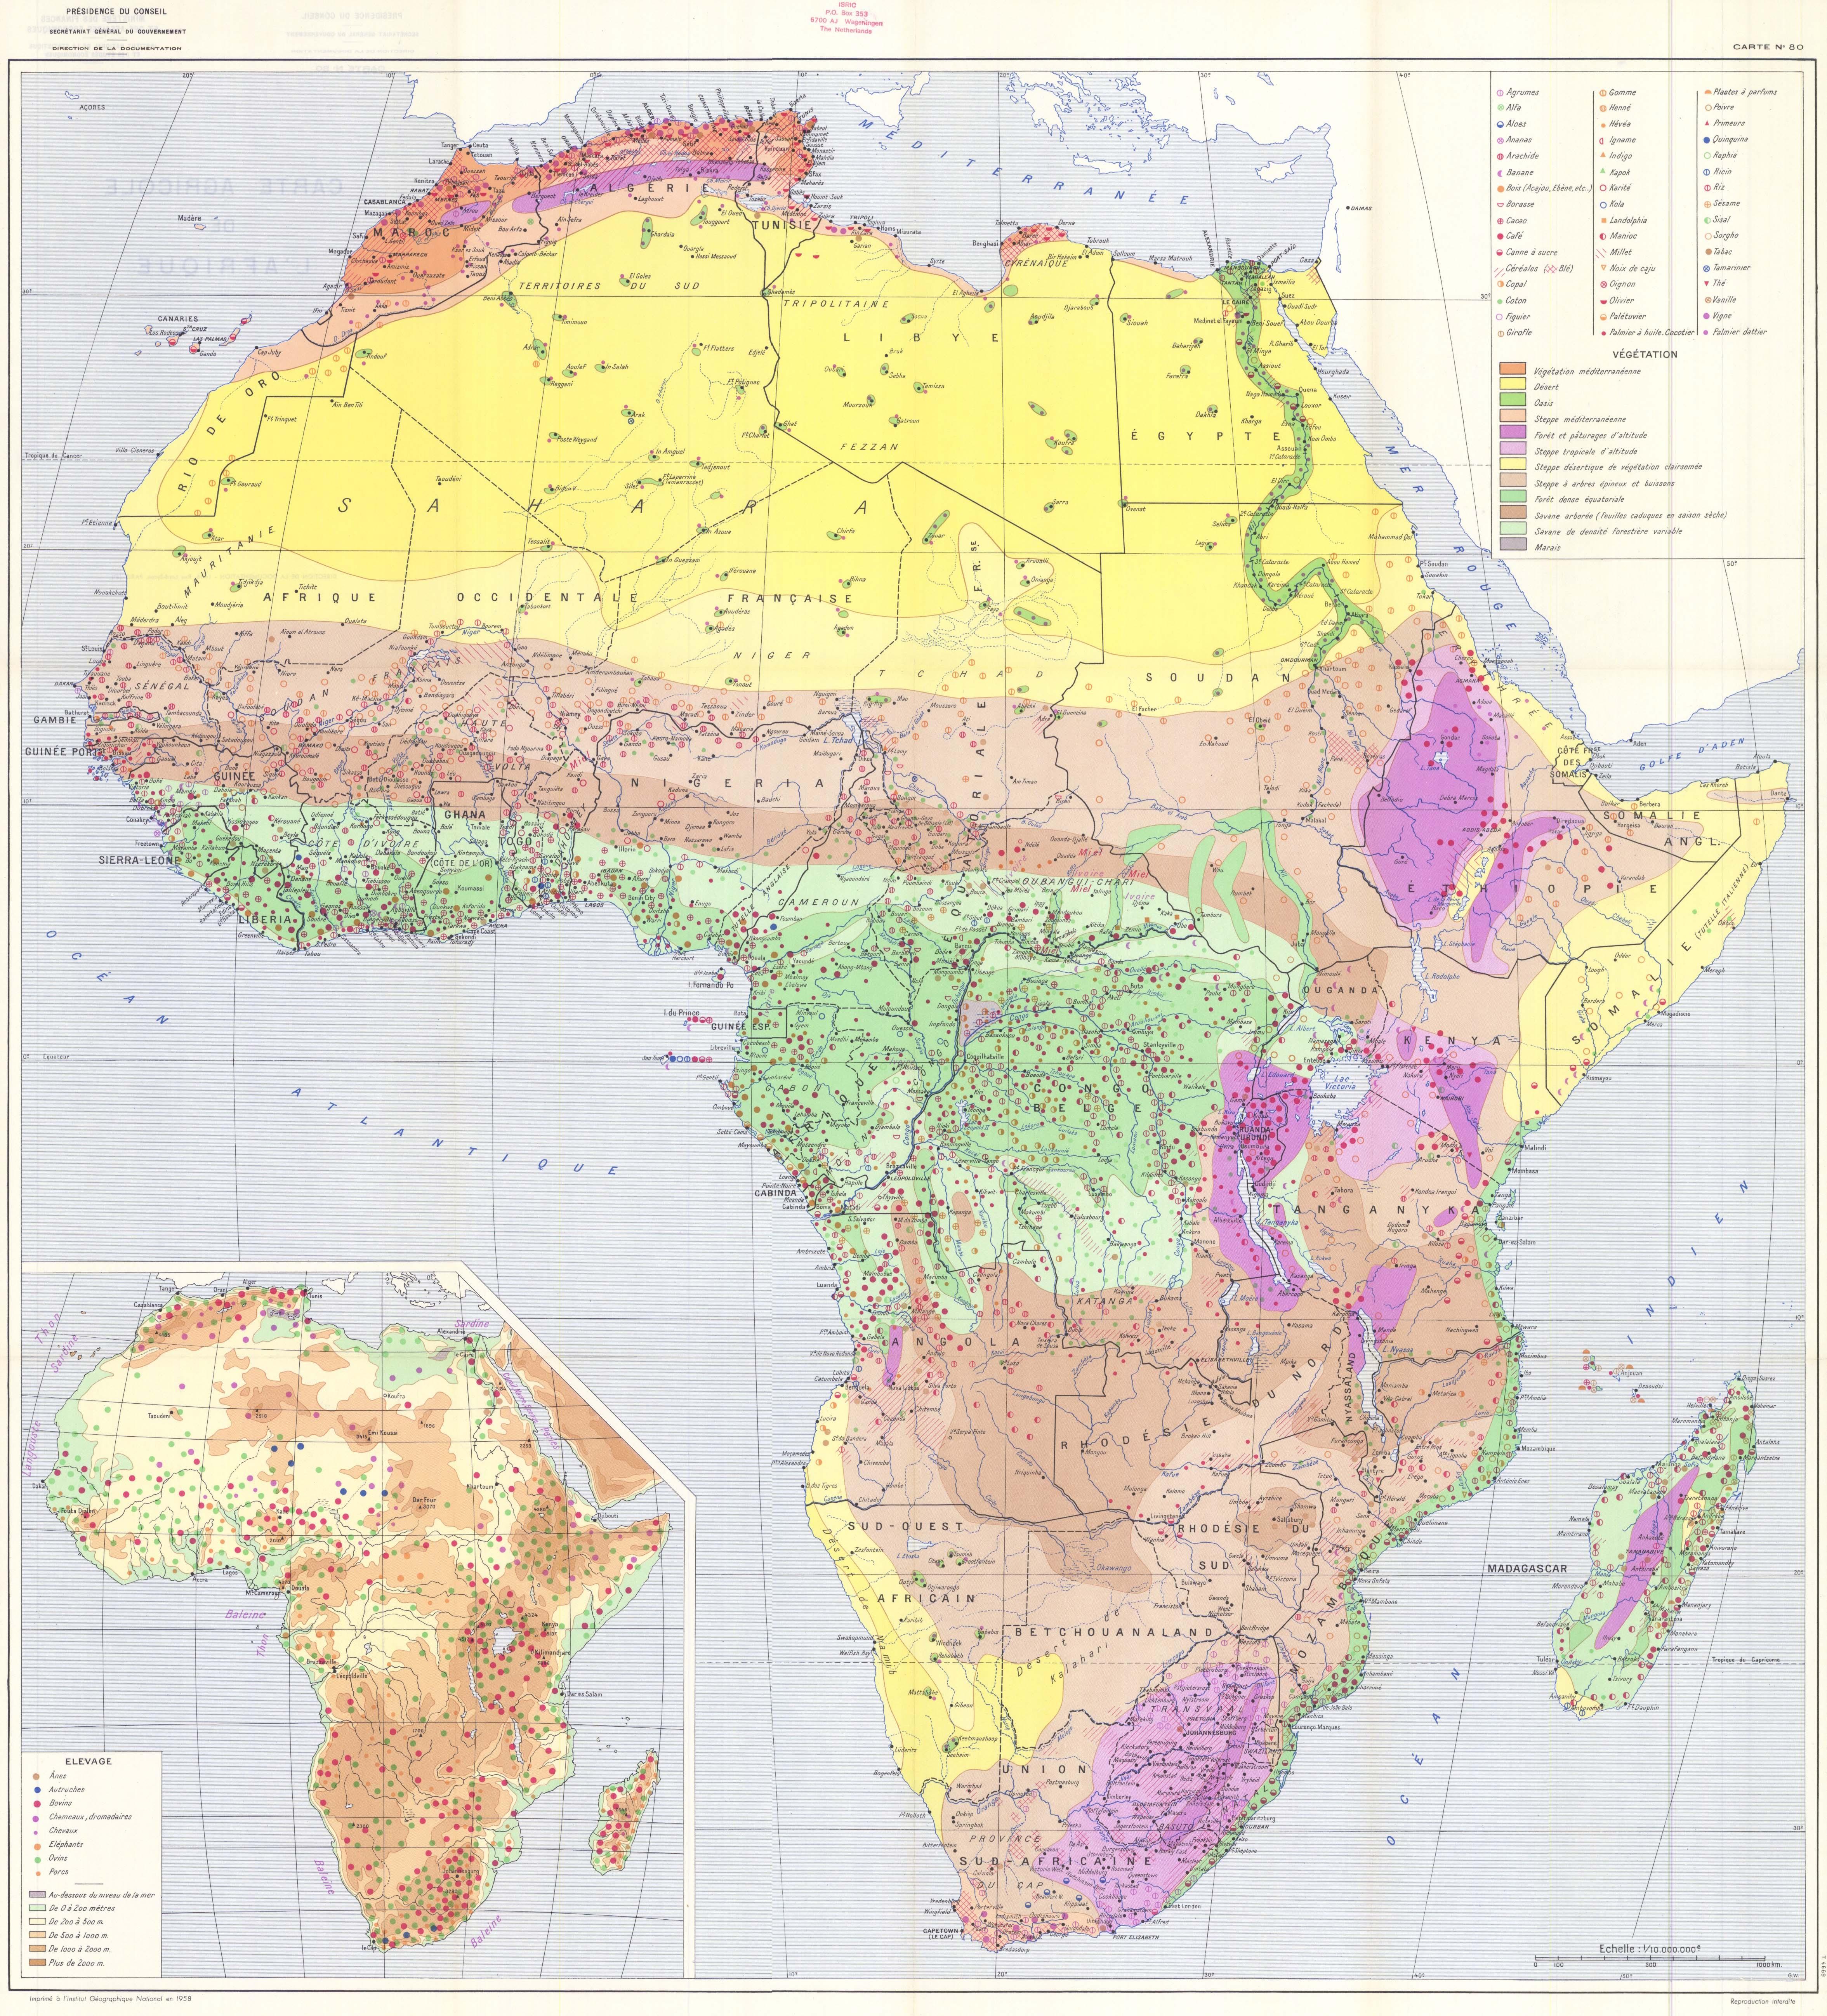 Mapa agrícola de África 1958